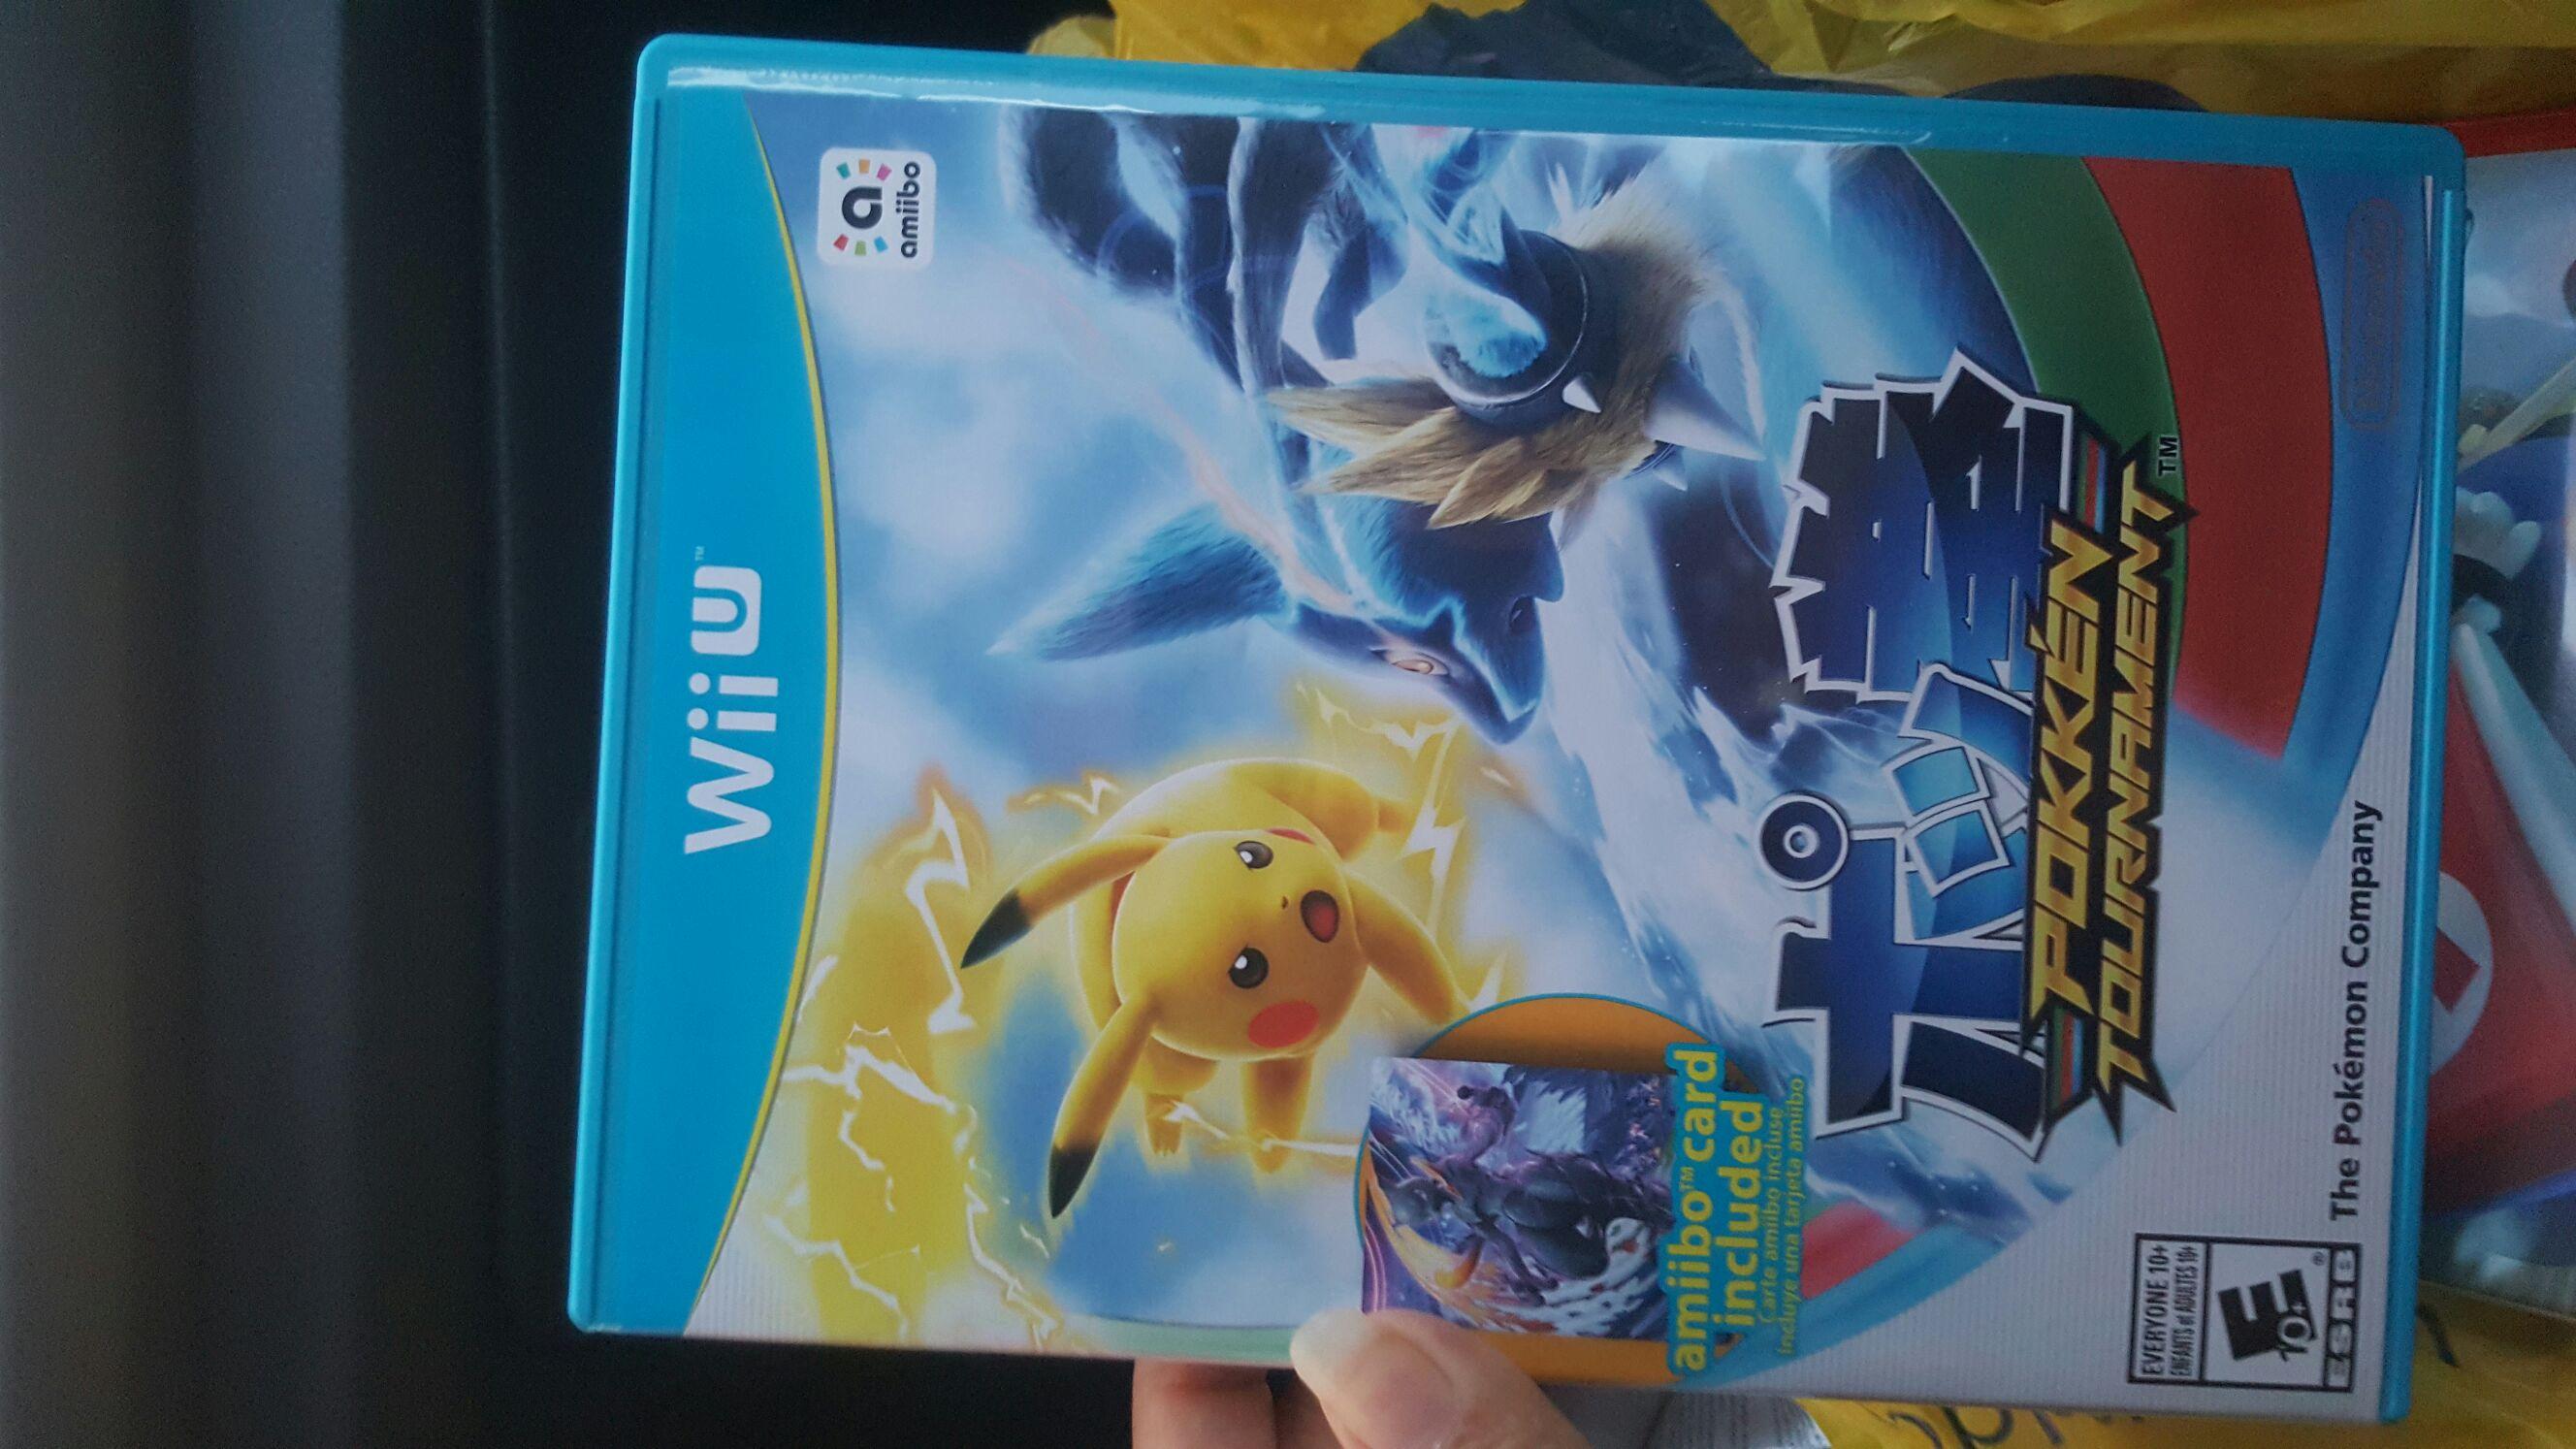 Coppel: Pokkén Tournament para Wii U a $180 y Mario Kart 8 a $234